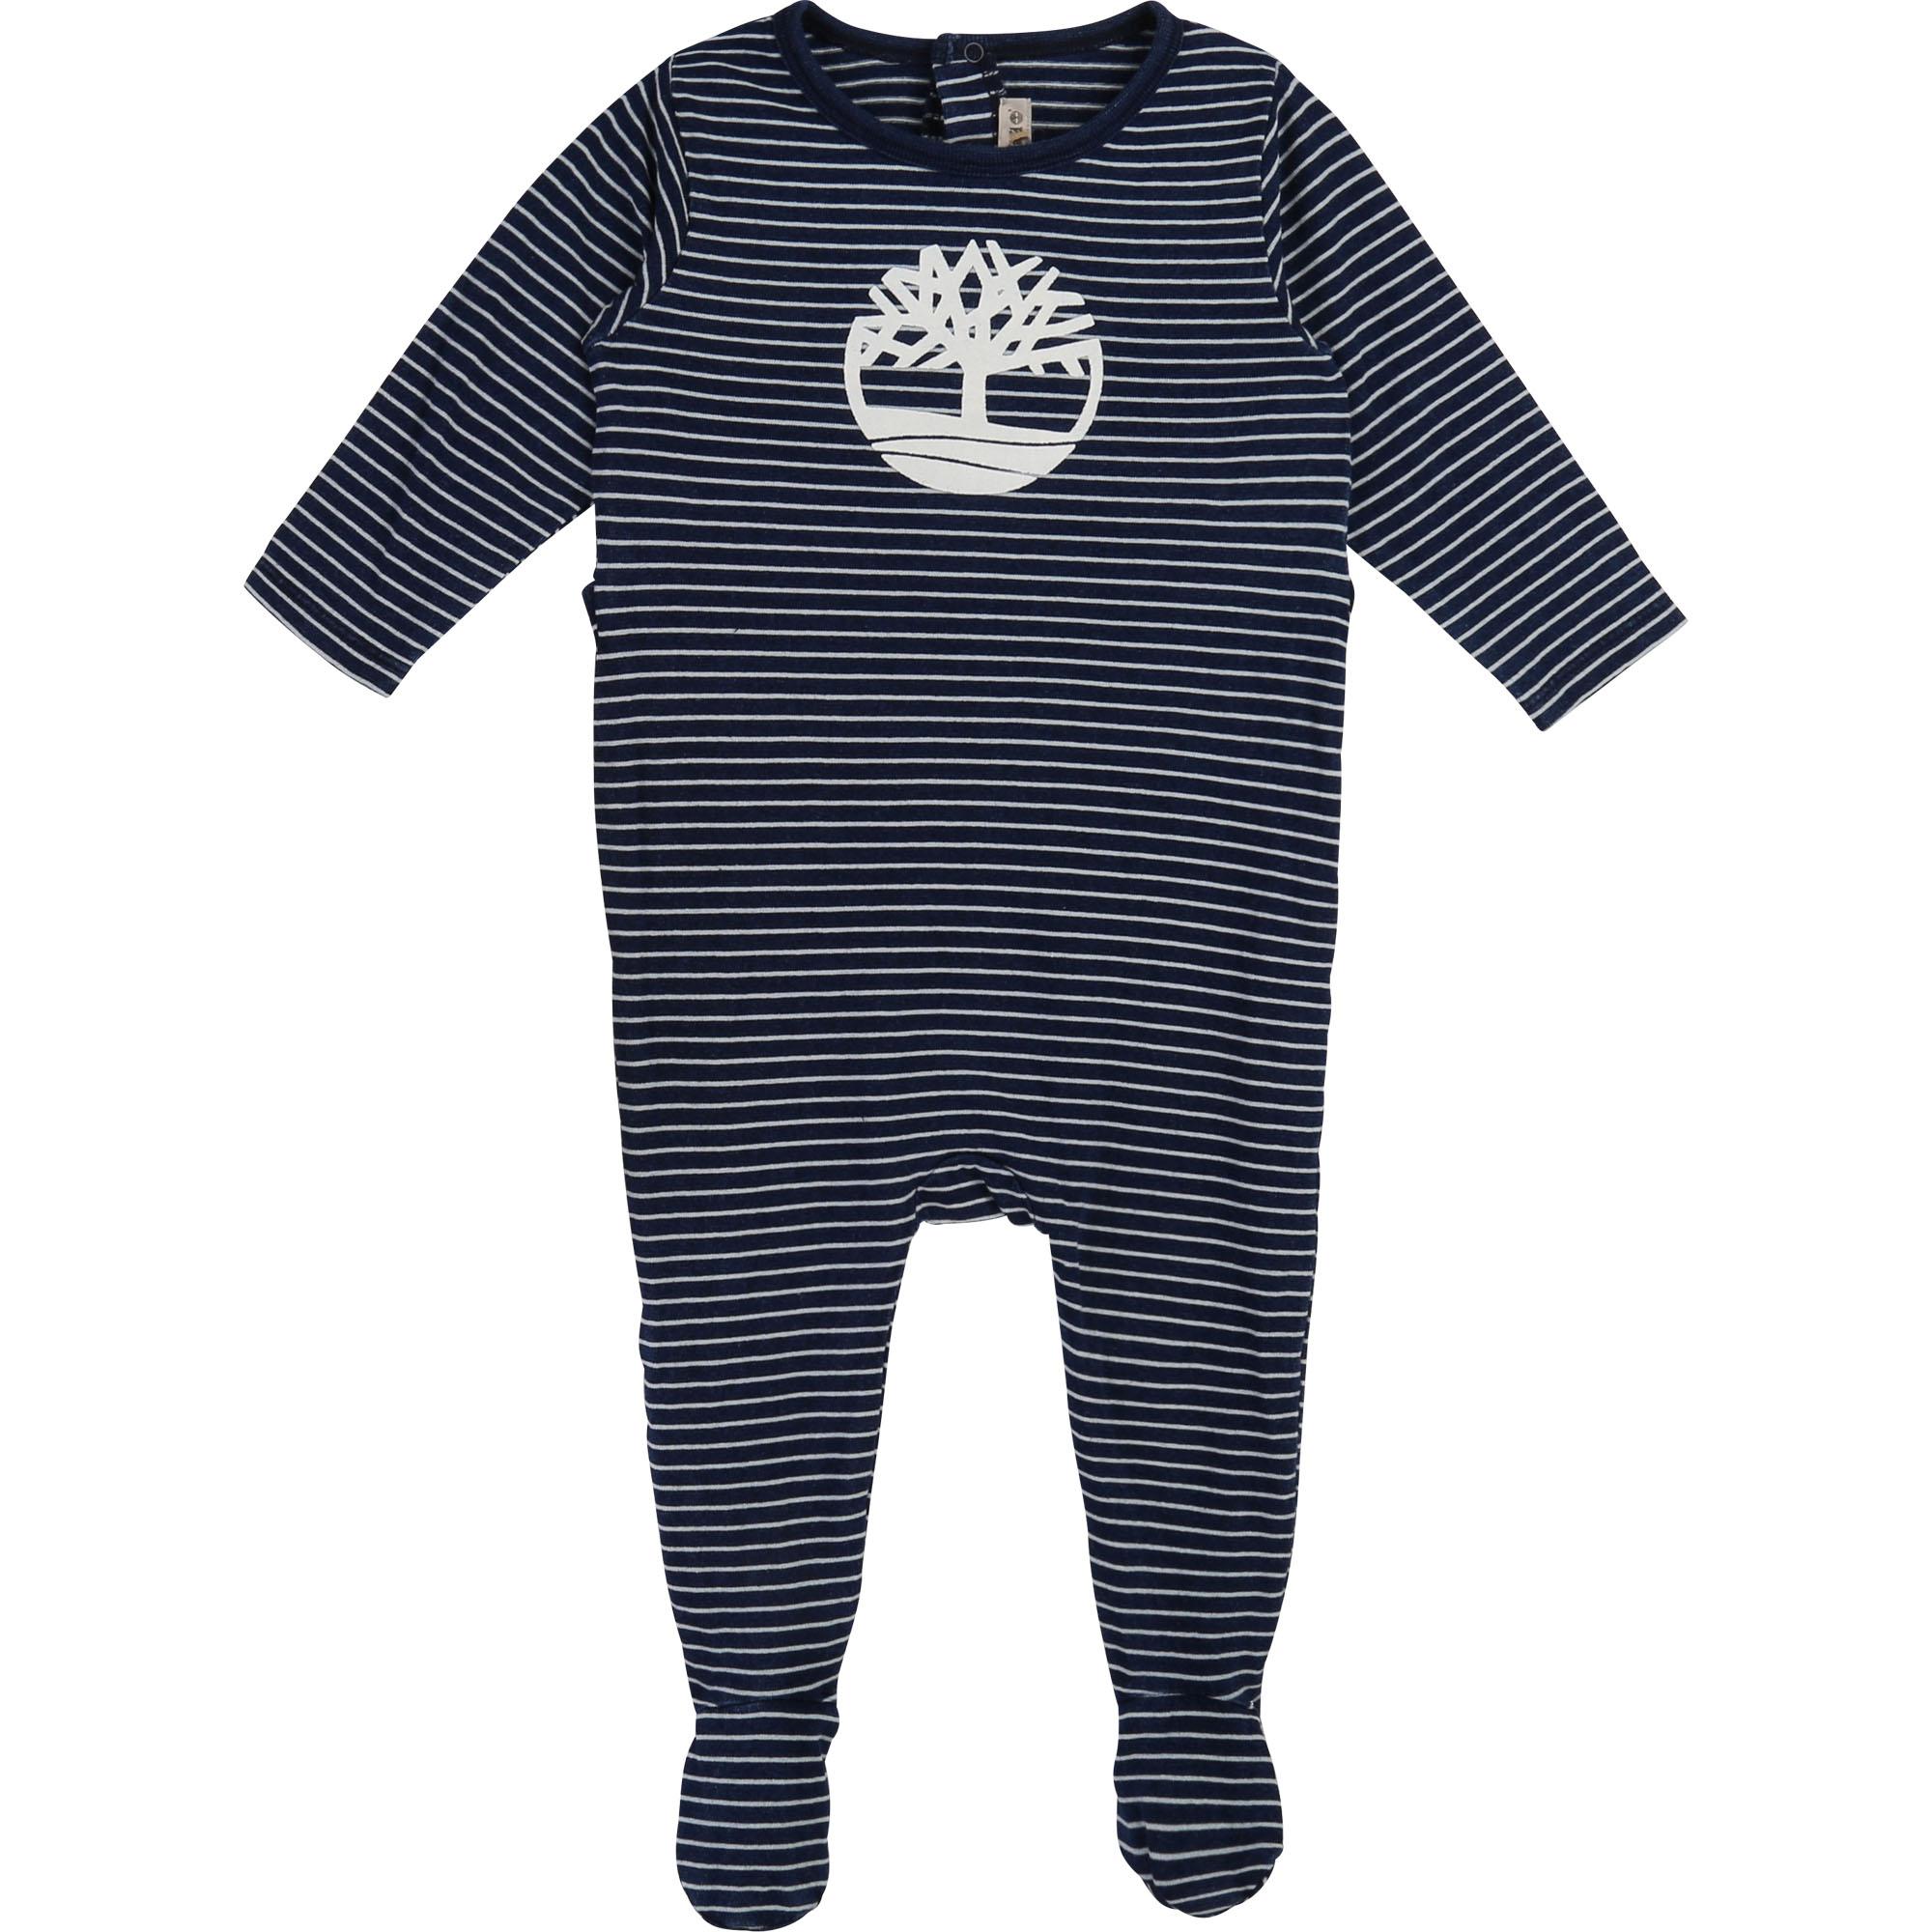 Pyjama en coton rayé TIMBERLAND BEBE COUCHE GARCON Indéterminé